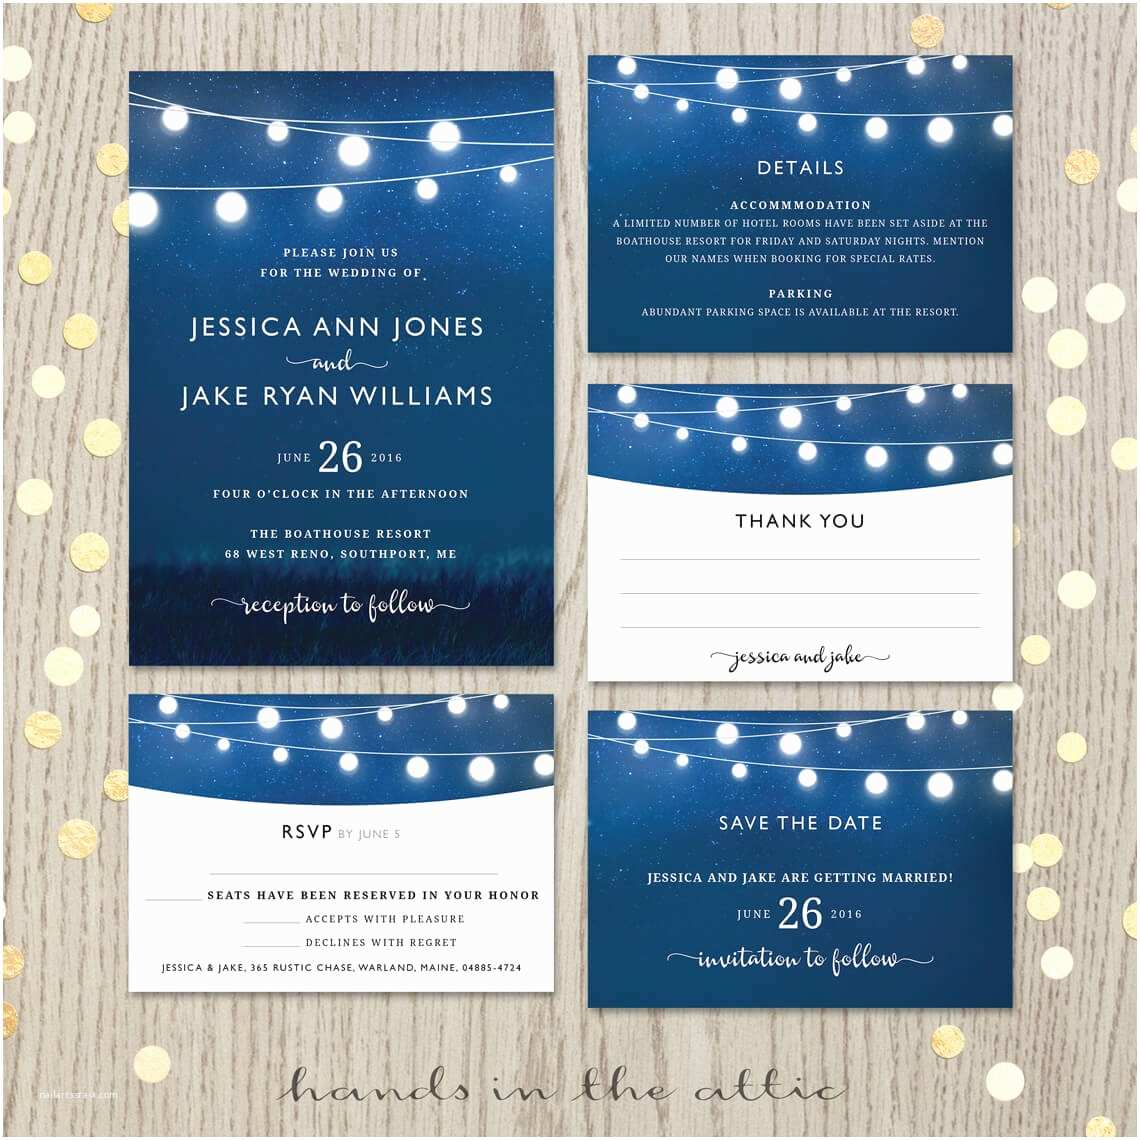 Royal Blue Wedding Invitations Royal Blue Wedding Invitation